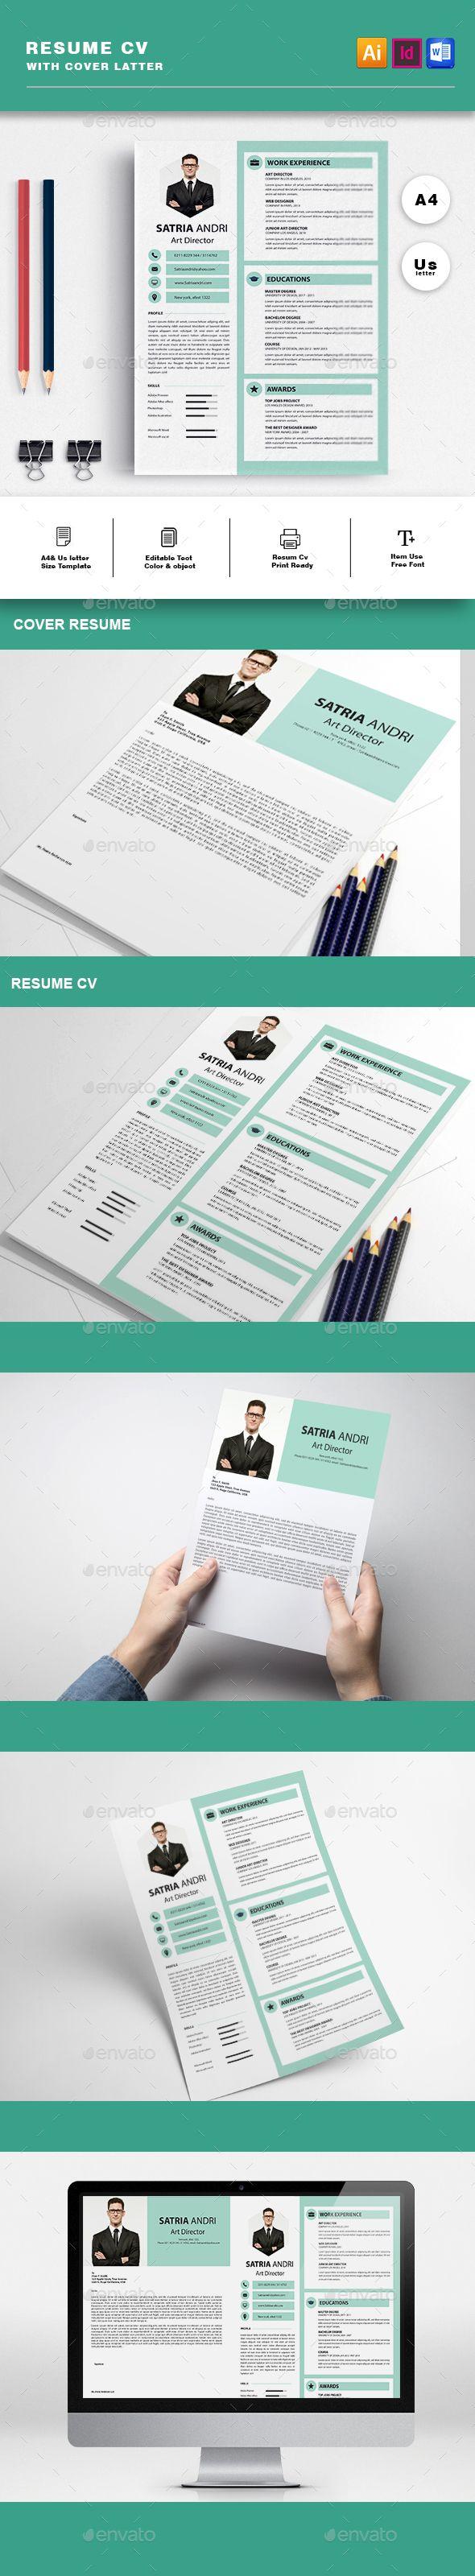 Resum/Cv - Resumes Stationery | Resume | Pinterest | Empleos y Utiles